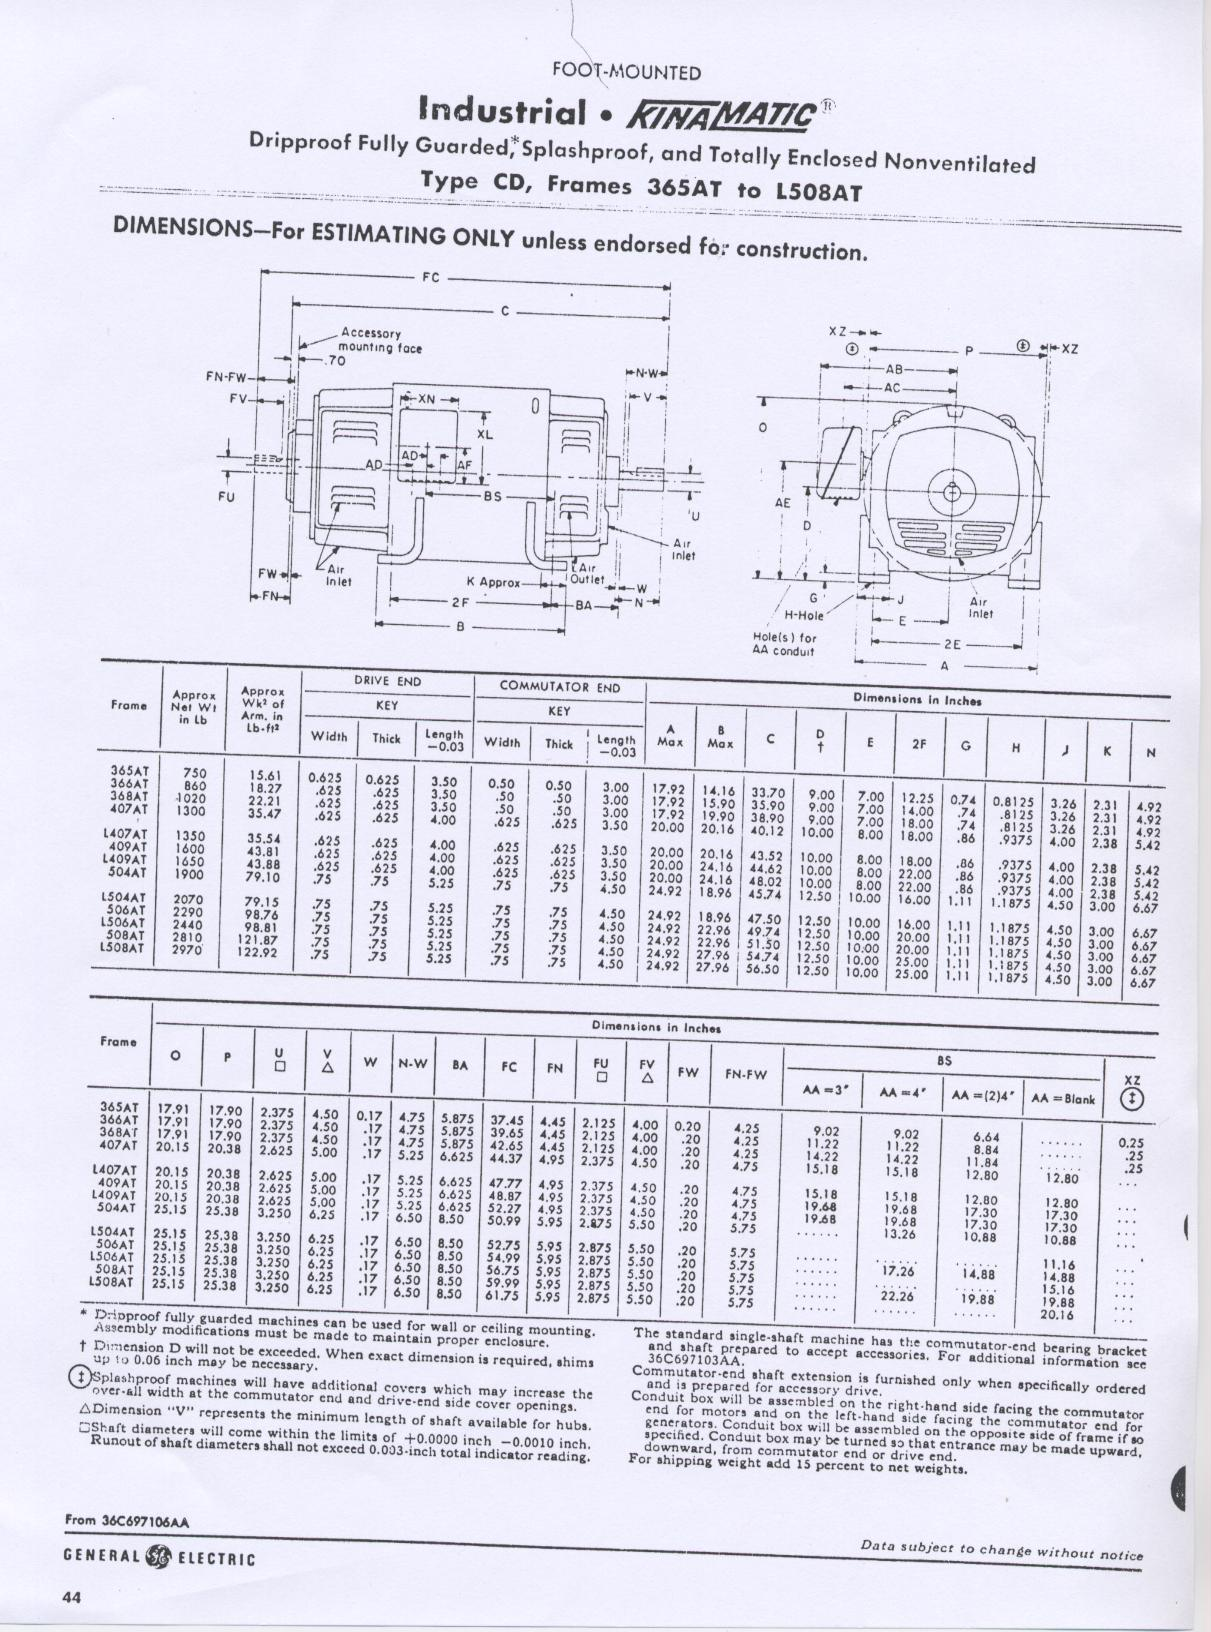 shunt signal wiring diagram 1996 honda civic fuse vfr 750 box cb 400